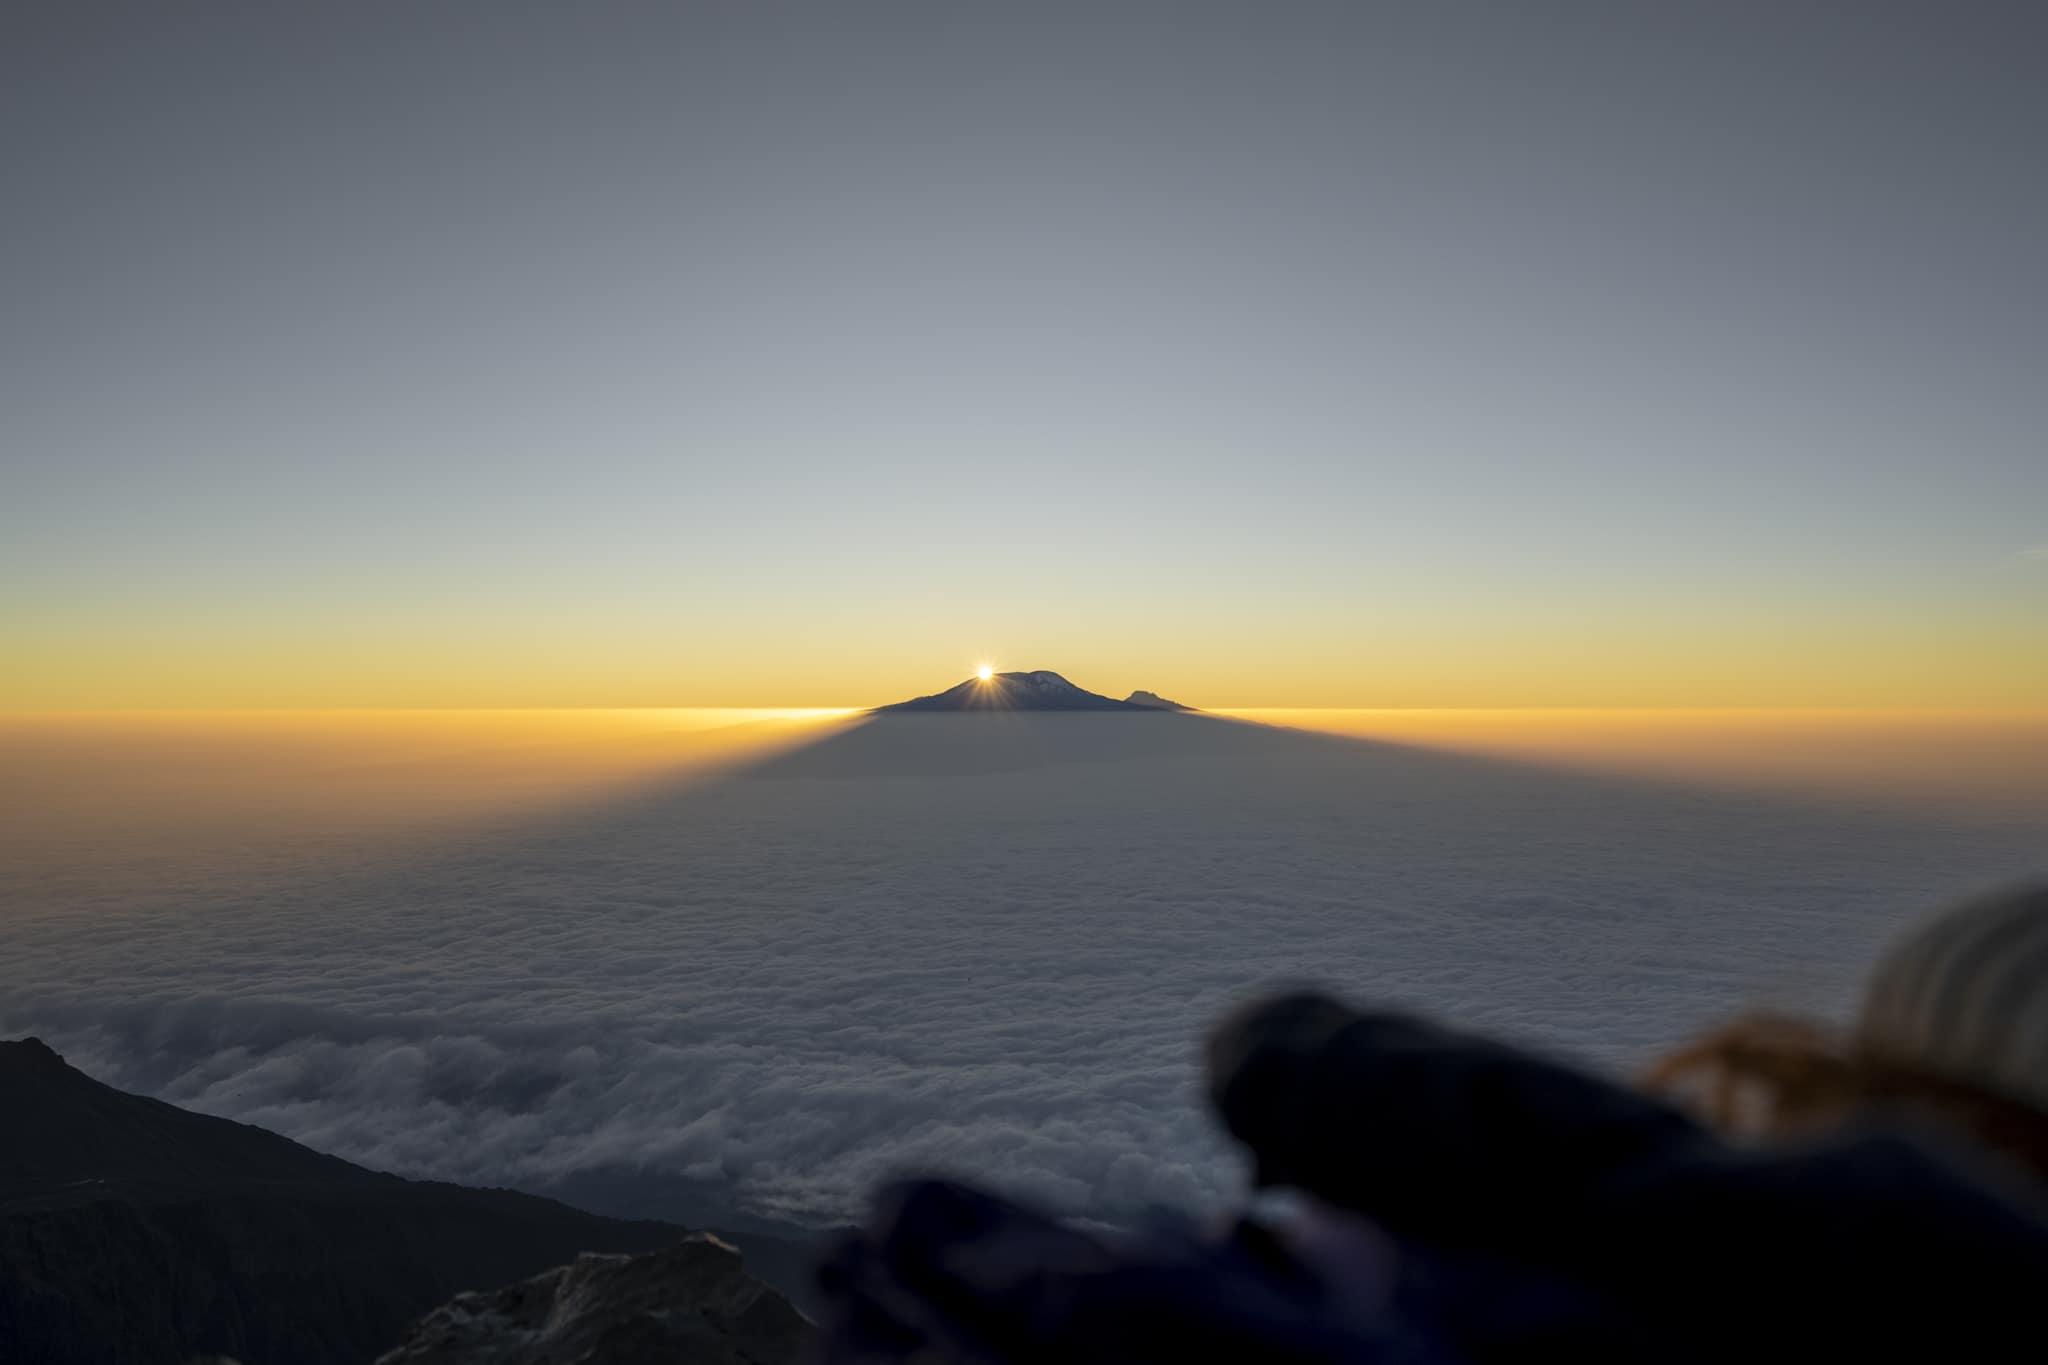 Kilimanjaro from Mt Meru